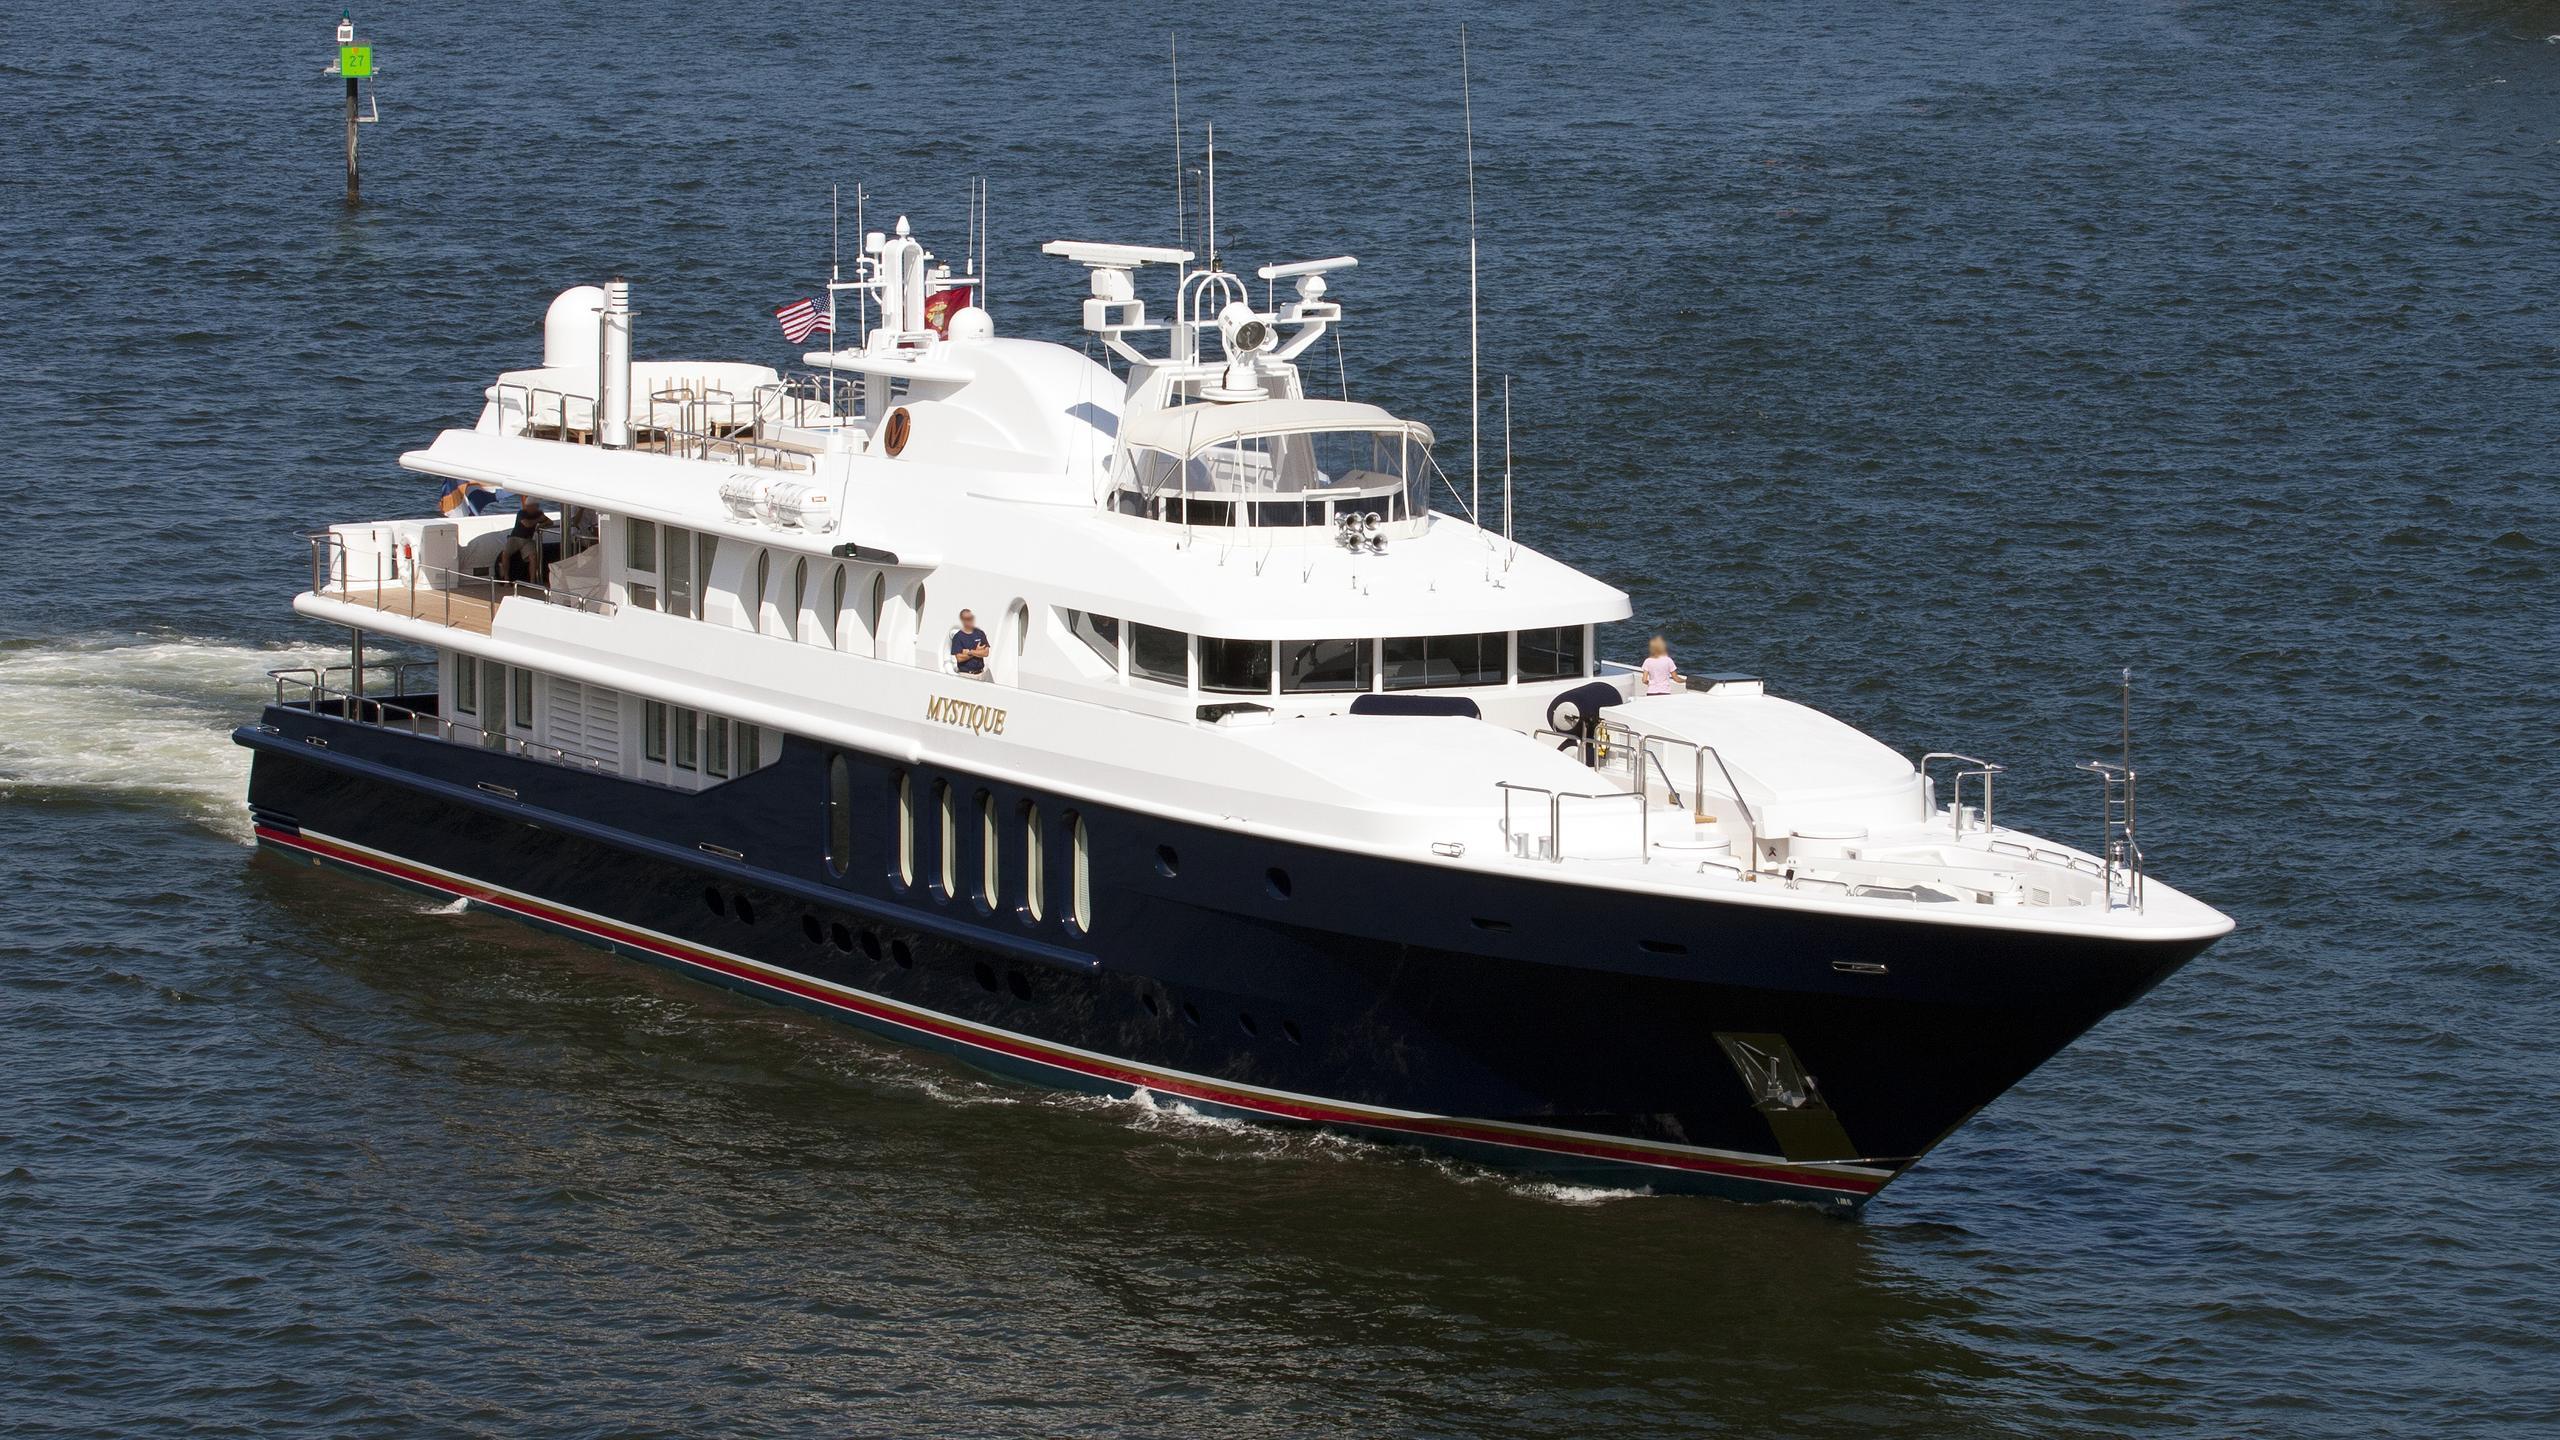 shes-a-10-motor-yacht-oceanfast-1989-49m-cruising